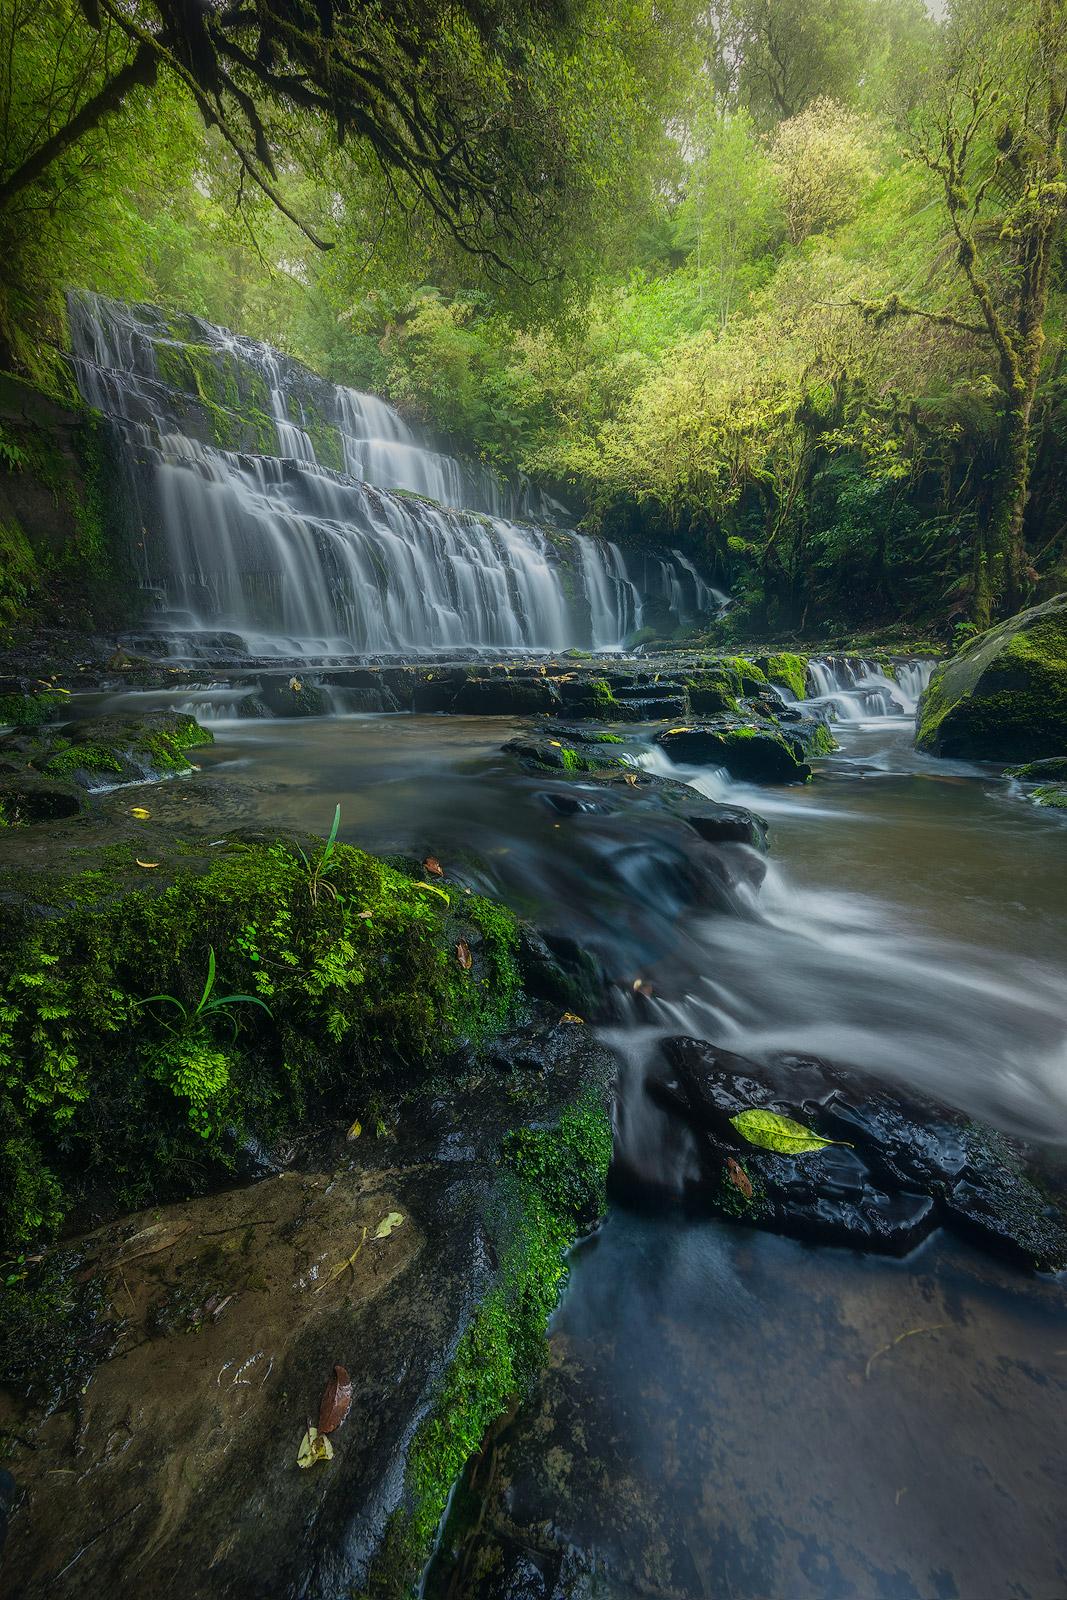 New Zealand, beautiful, creek, landscape, pond, pool, purakaunui falls, south island, stream, sun, the caitlins, water body, waterfall, photo